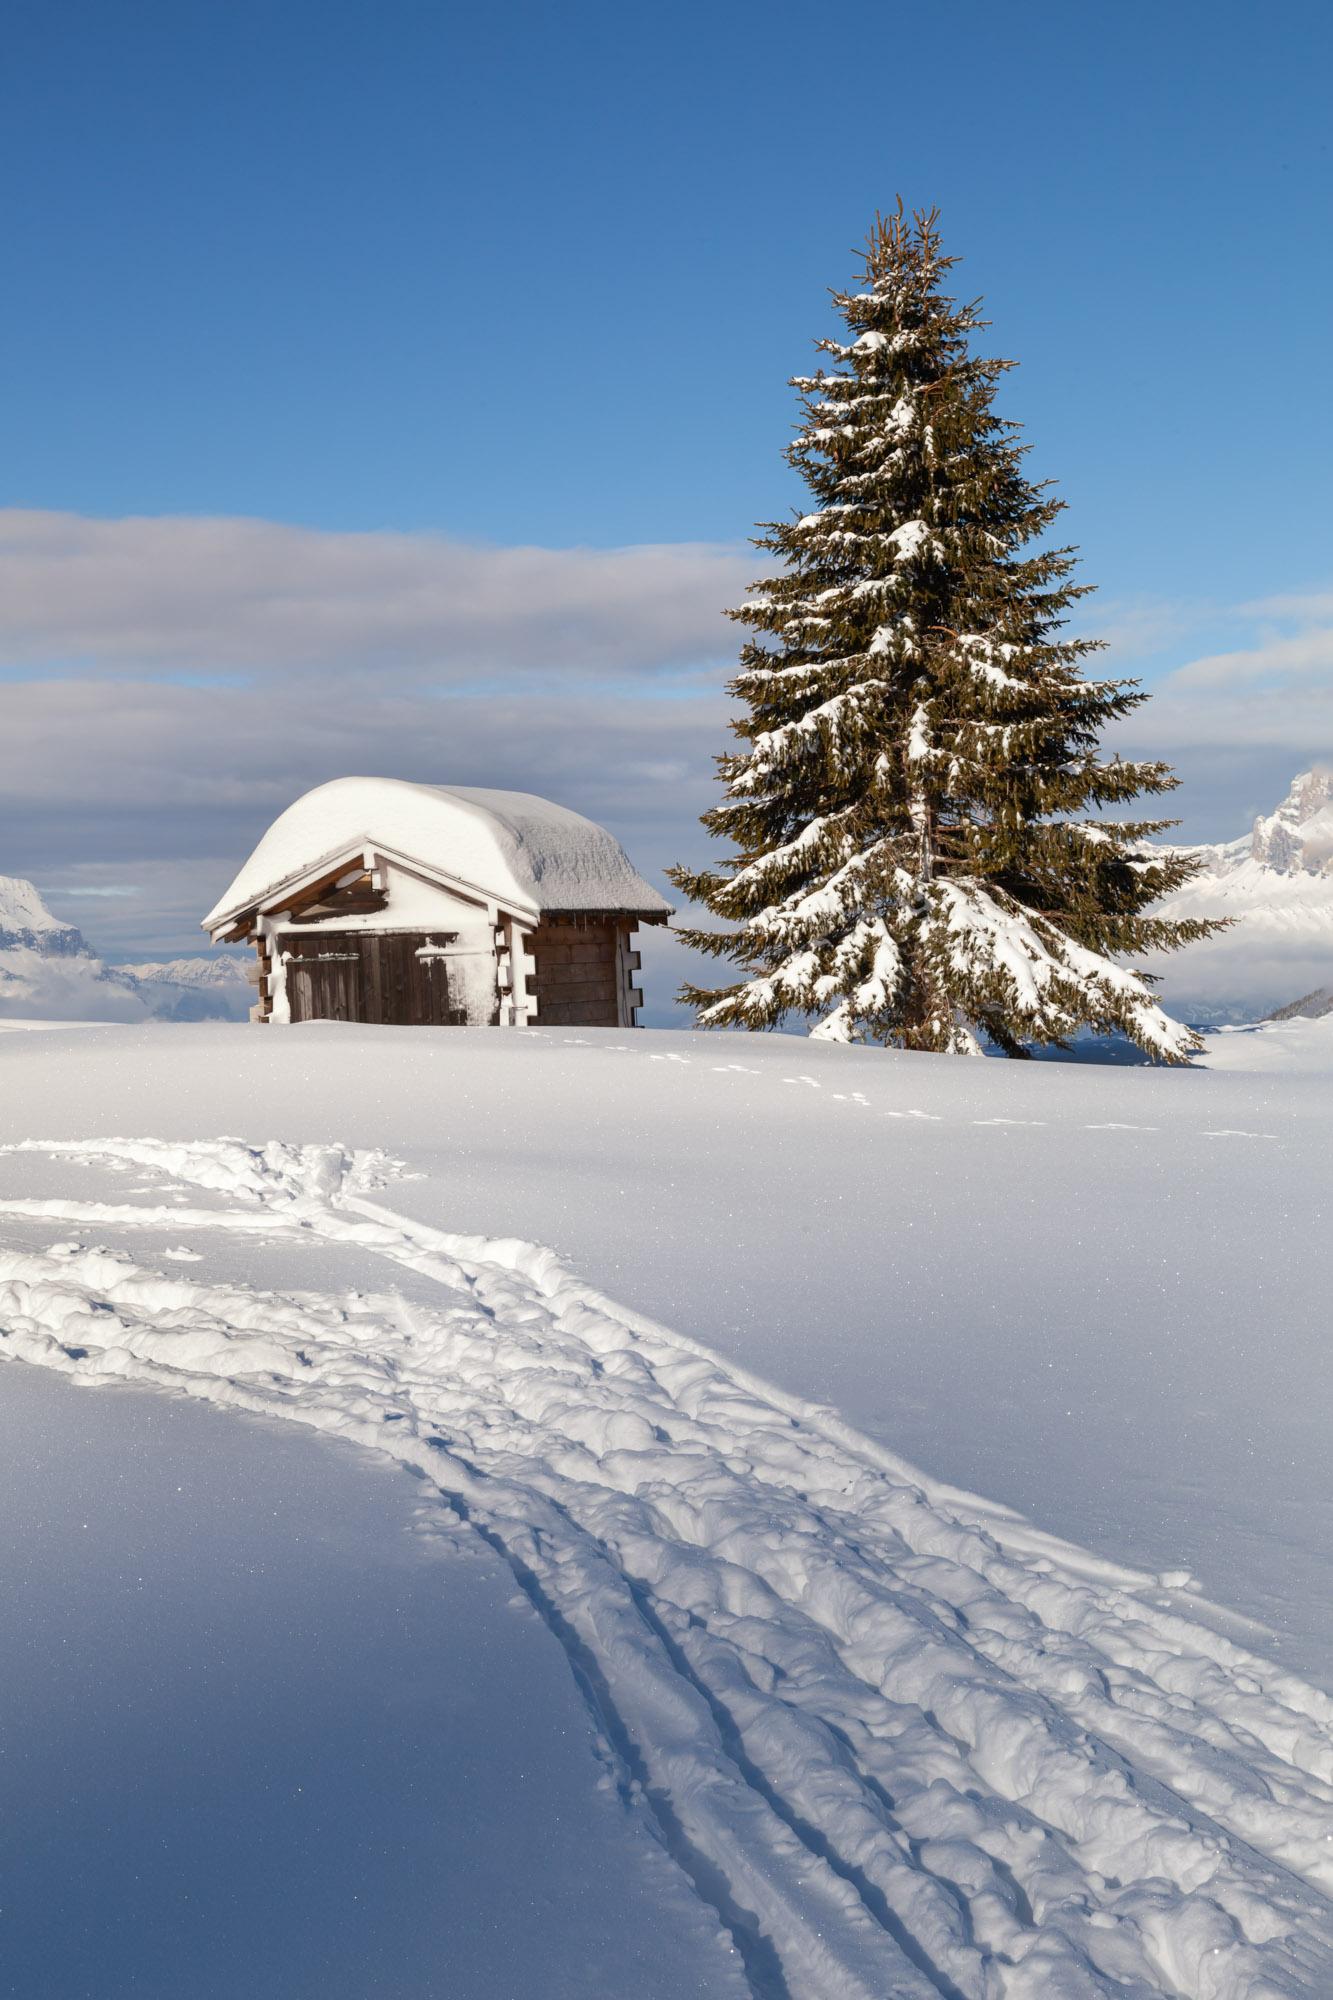 Small Hut on Ski Resort, Megeve, France